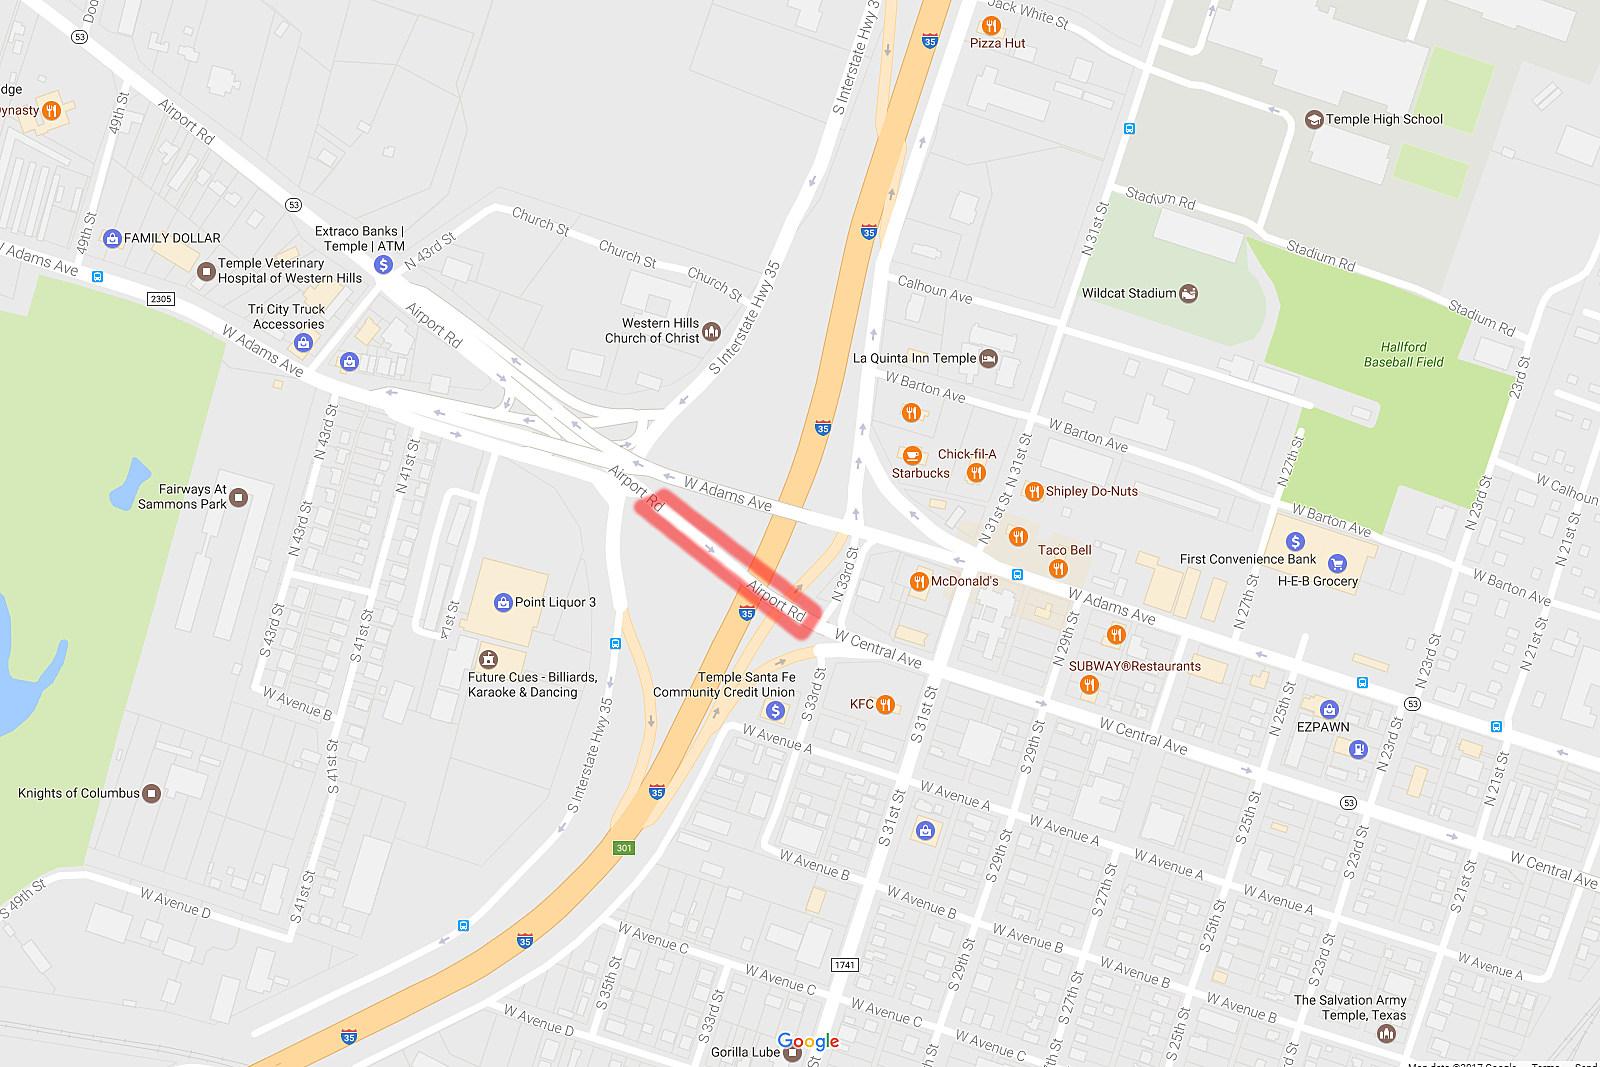 Google Maps with Edits